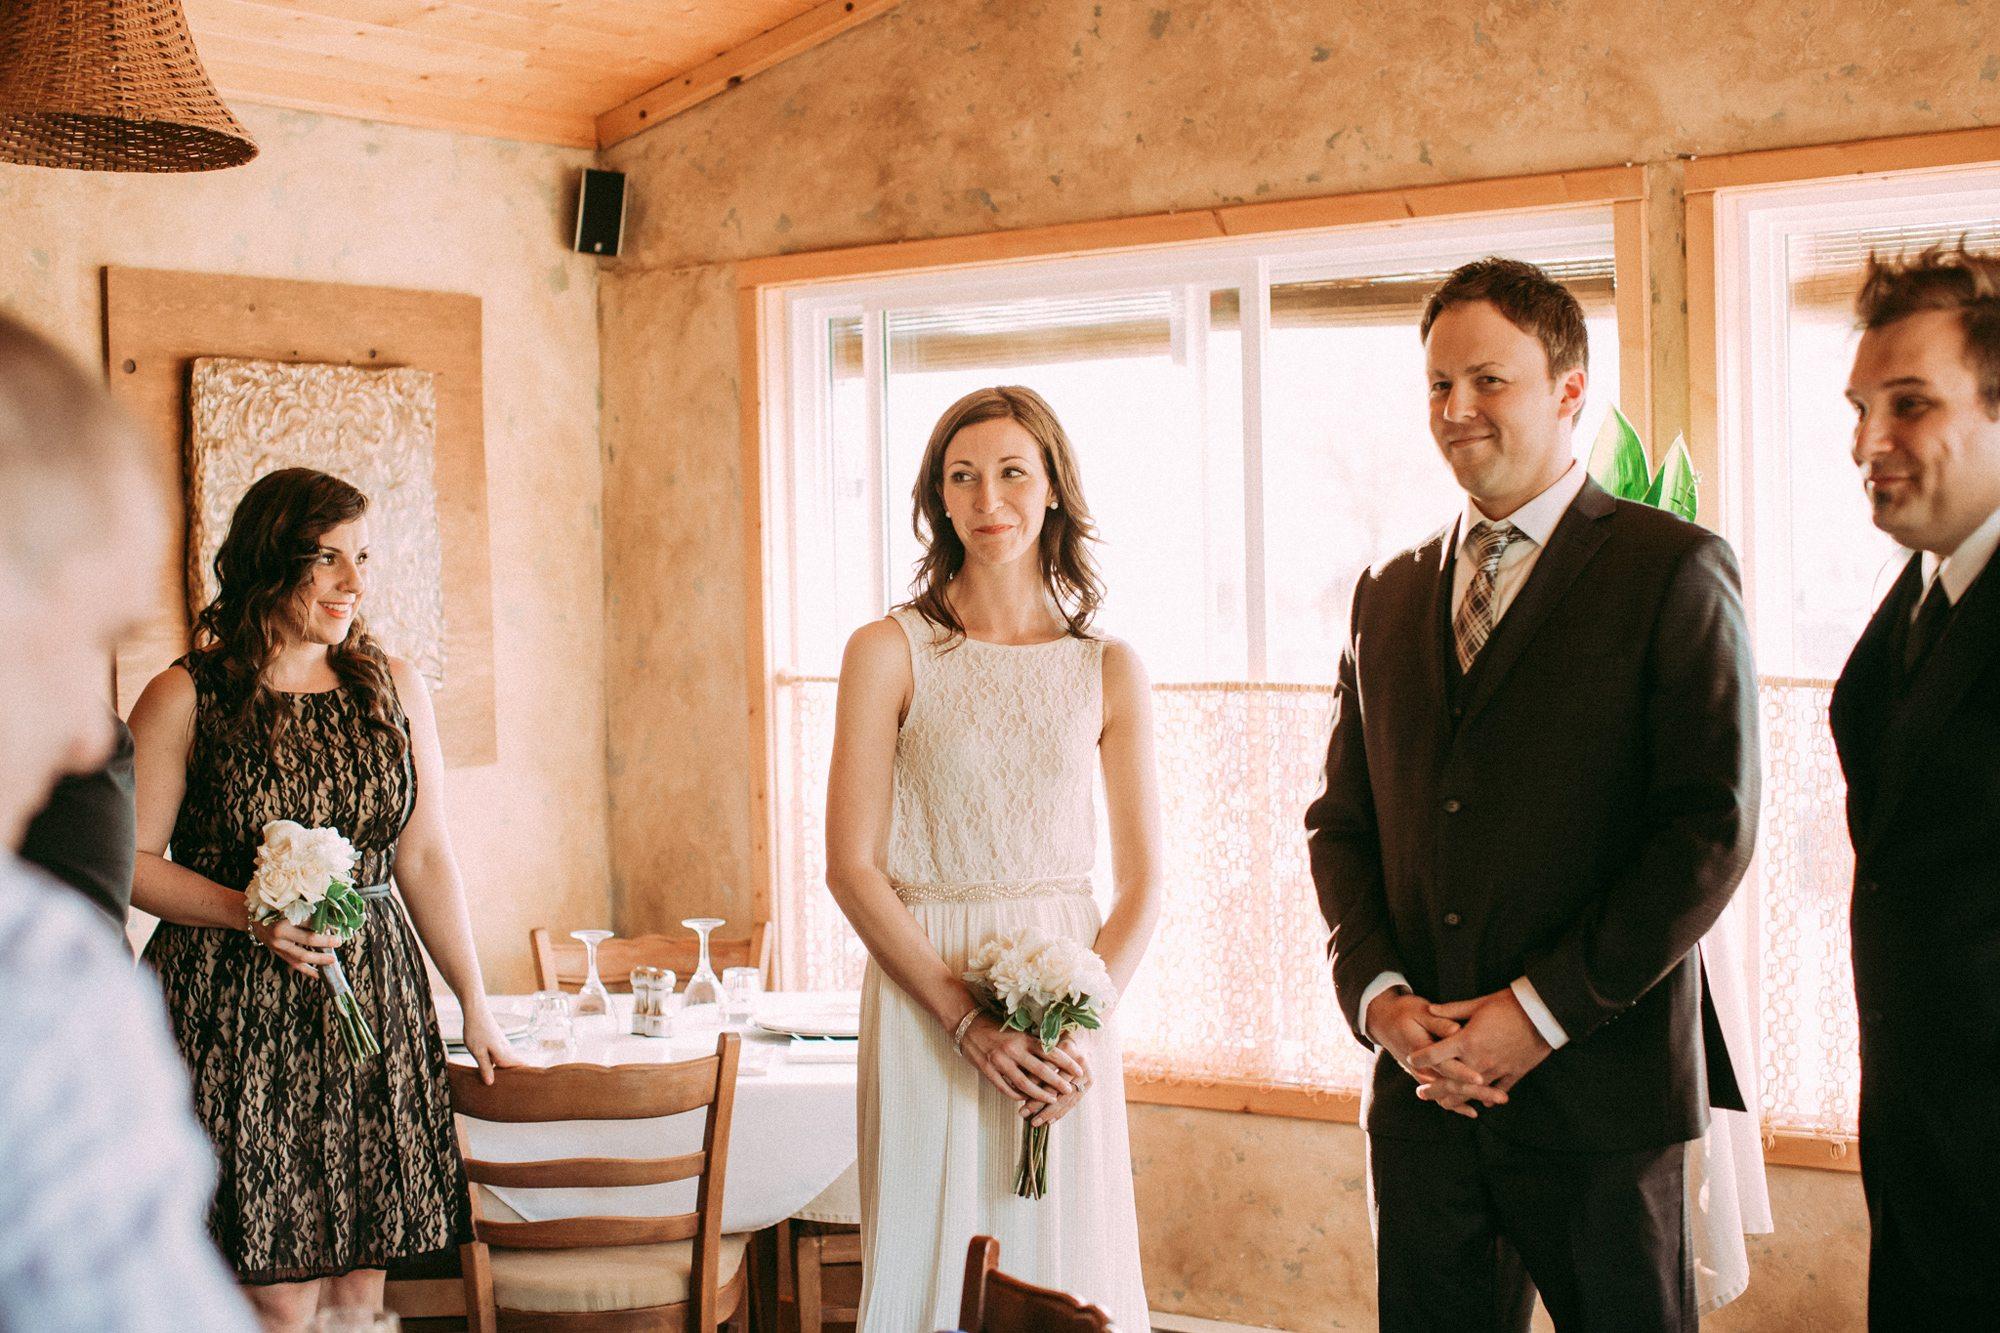 903-vancouver-elopement-photographer